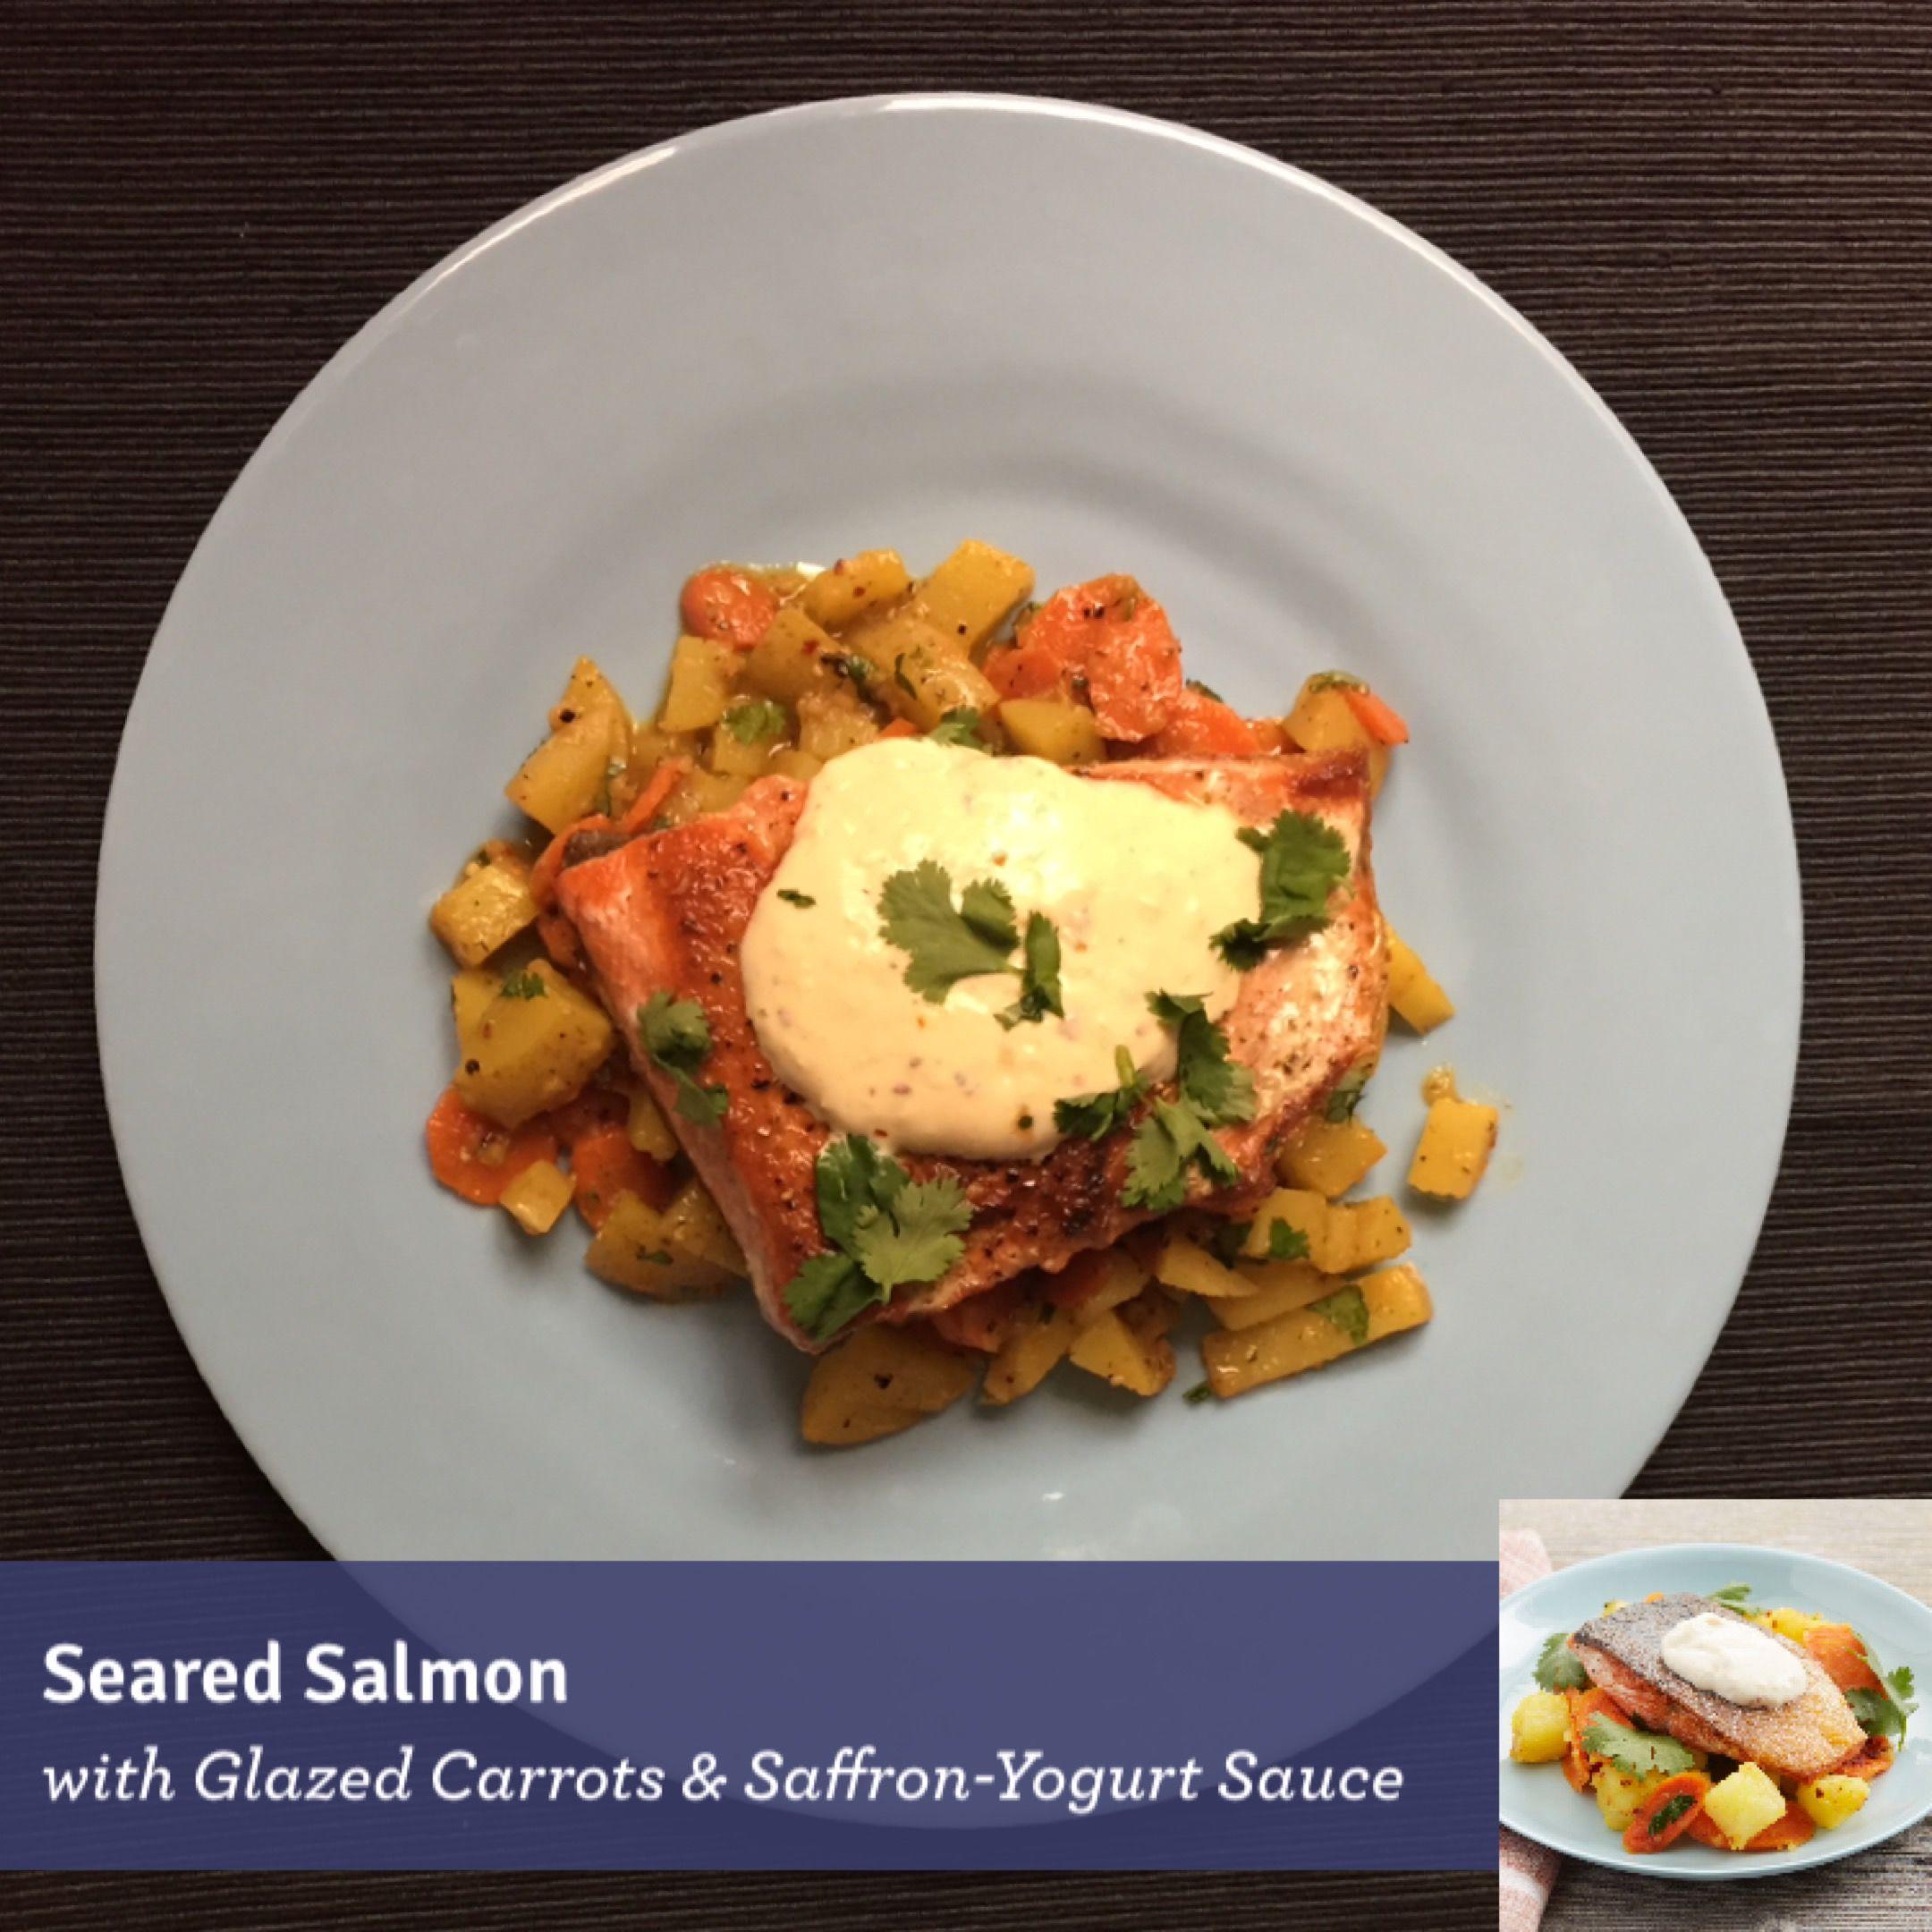 Blue apron yogurt sauce - Seared Salmon With Glazed Carrots Saffron Yogurt Sauce Http Dlink Glazed Carrotsblue Apronyogurt Sauce